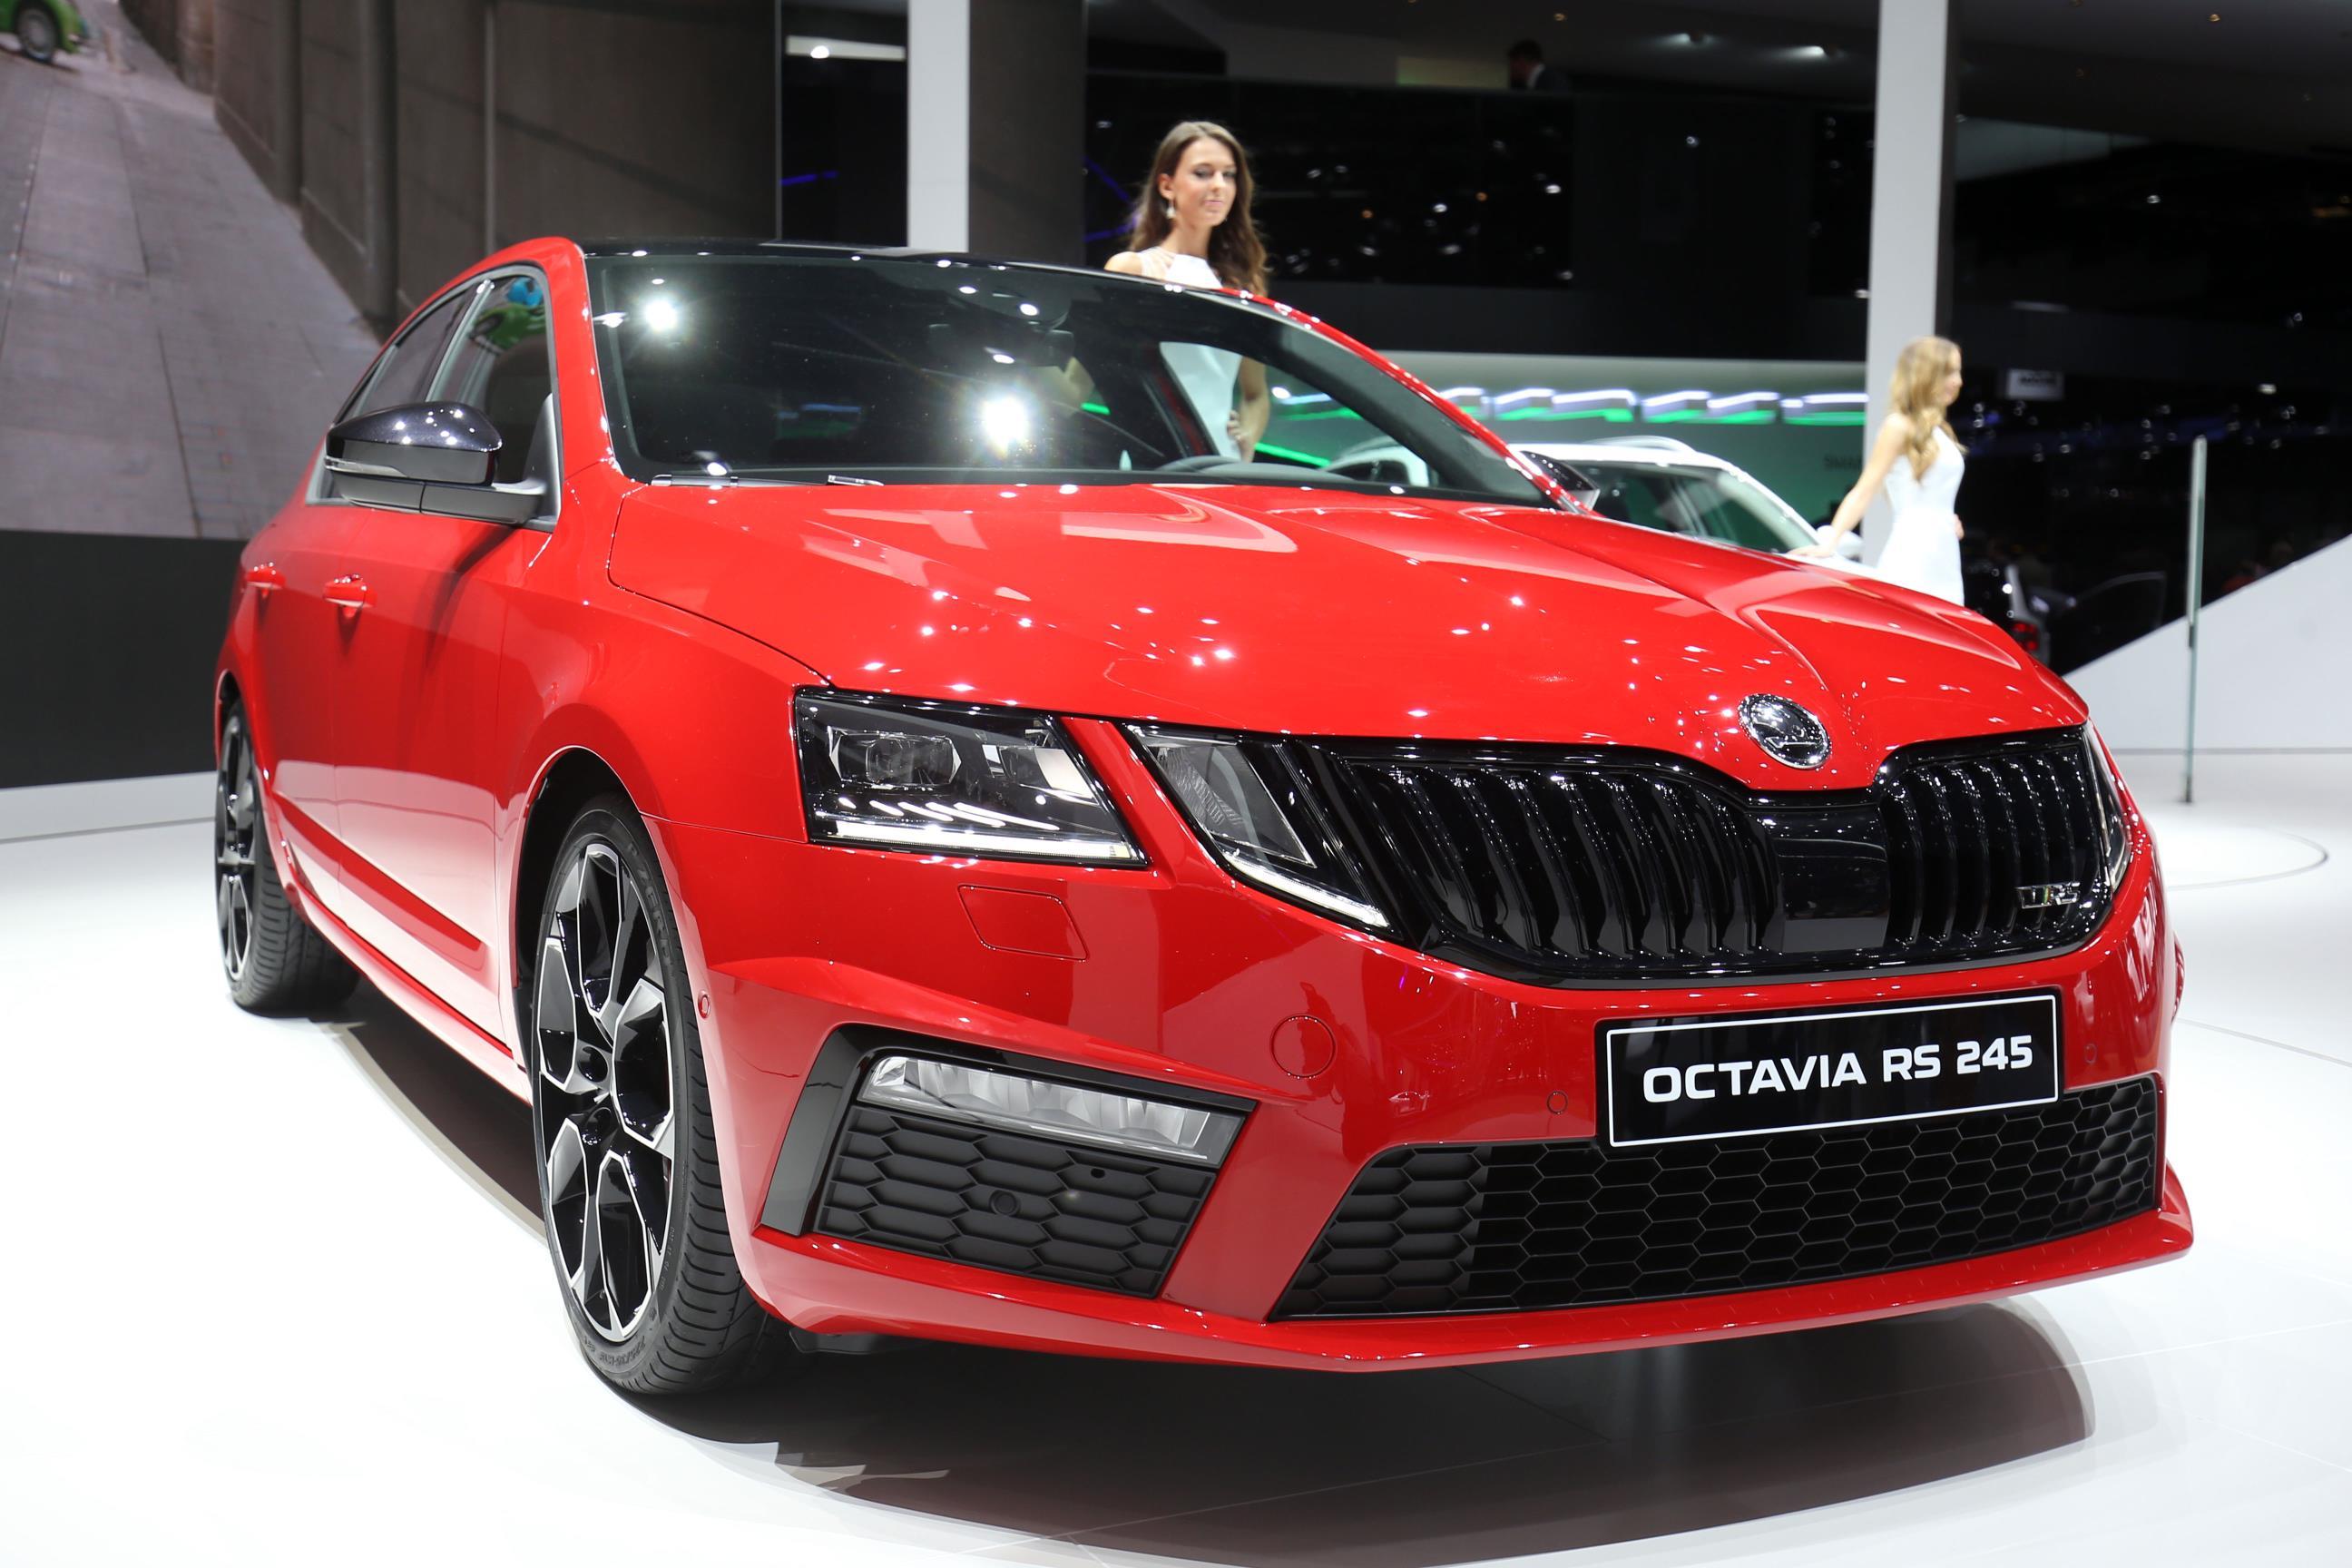 octavia rs 245 debuts in geneva skoda 39 s gti gets 7 speed dsg more power autoevolution. Black Bedroom Furniture Sets. Home Design Ideas